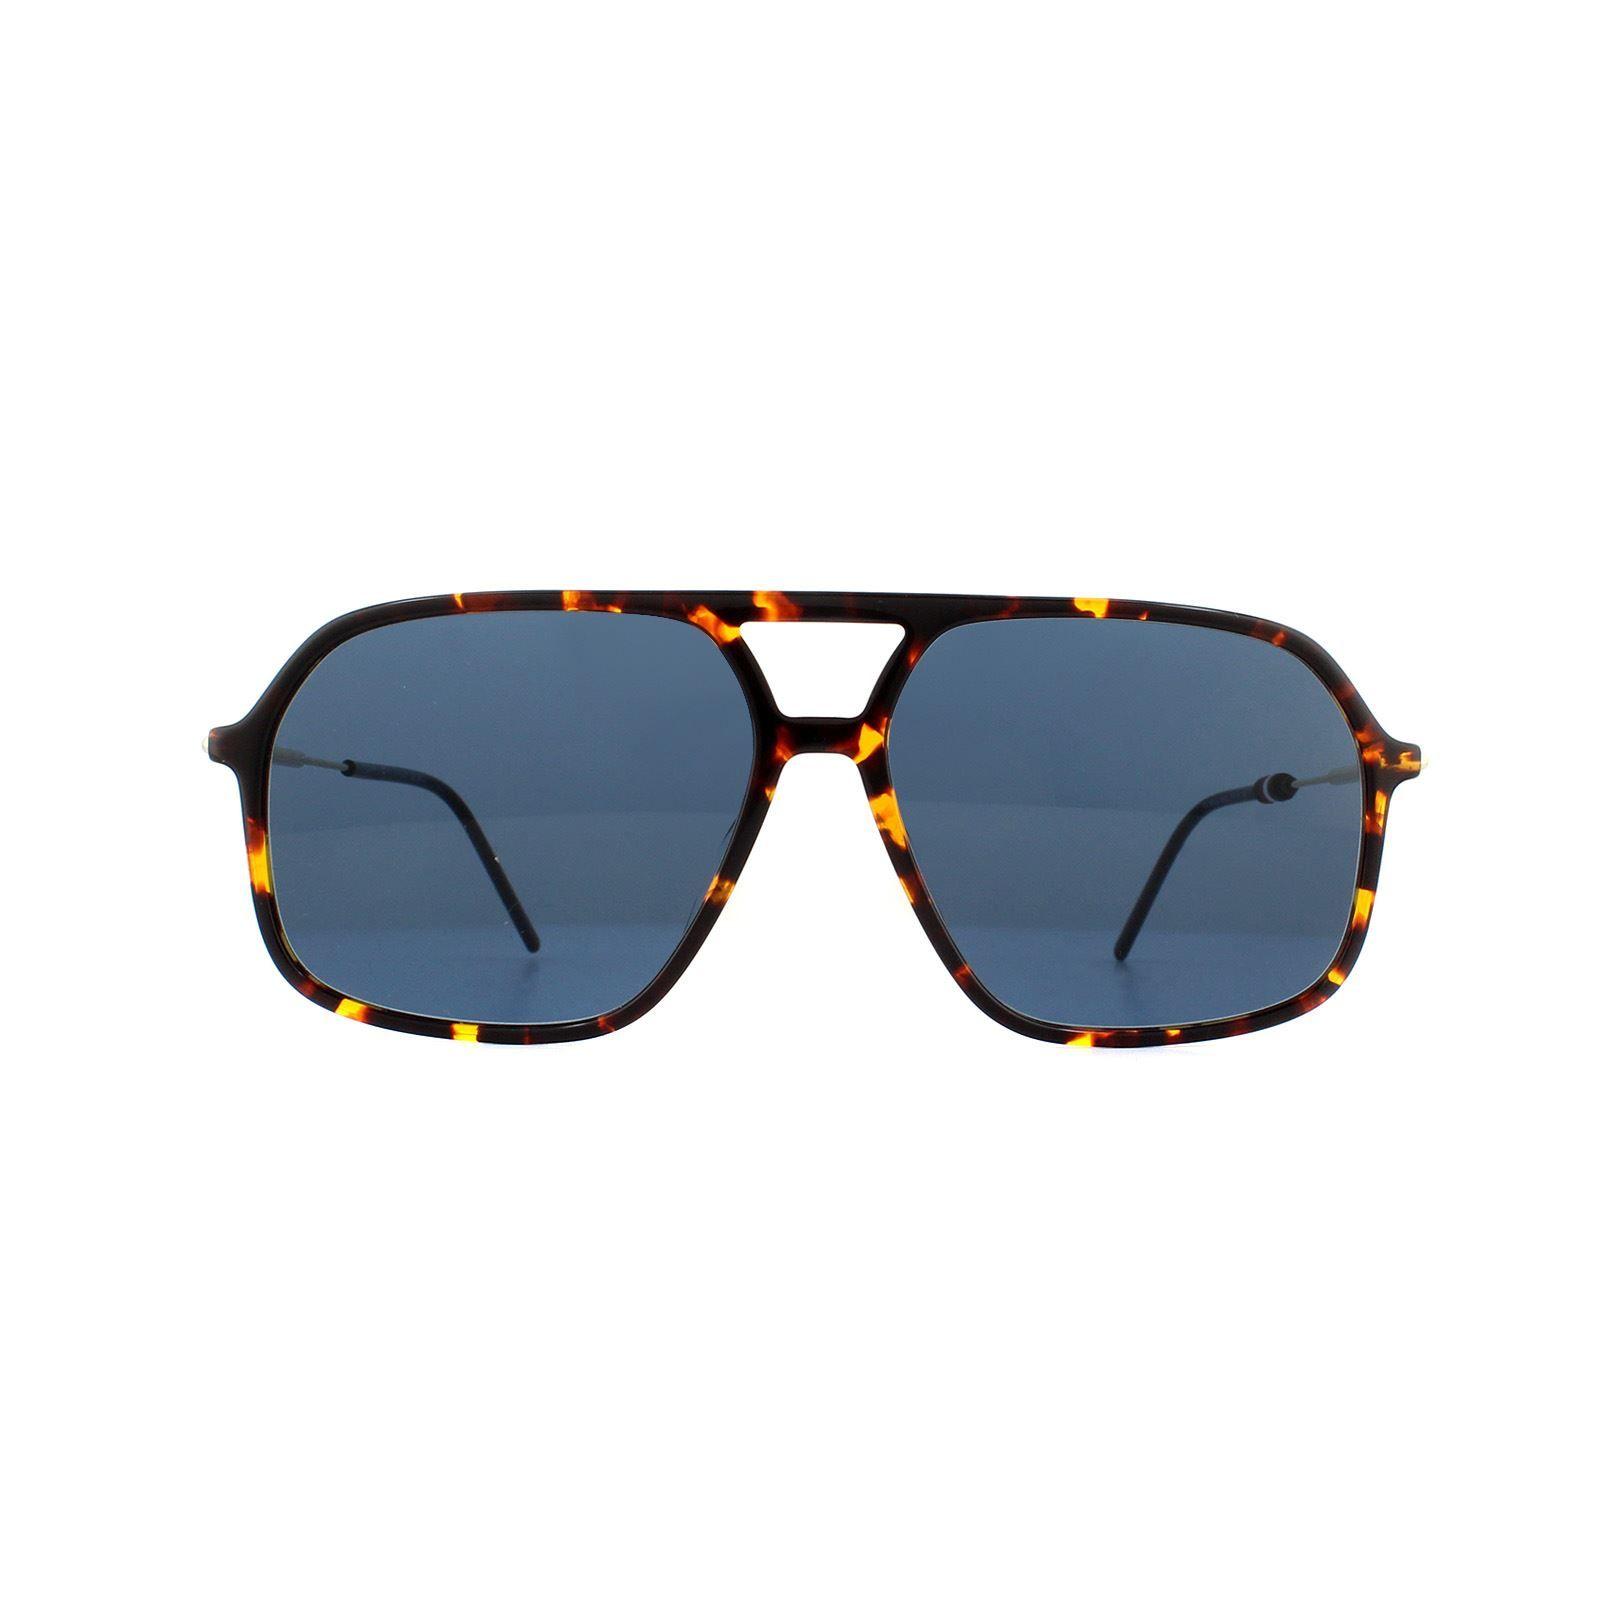 Tommy Hilfiger Sunglasses Th 1645/S 086 Ku Dark Havana Blue Avio